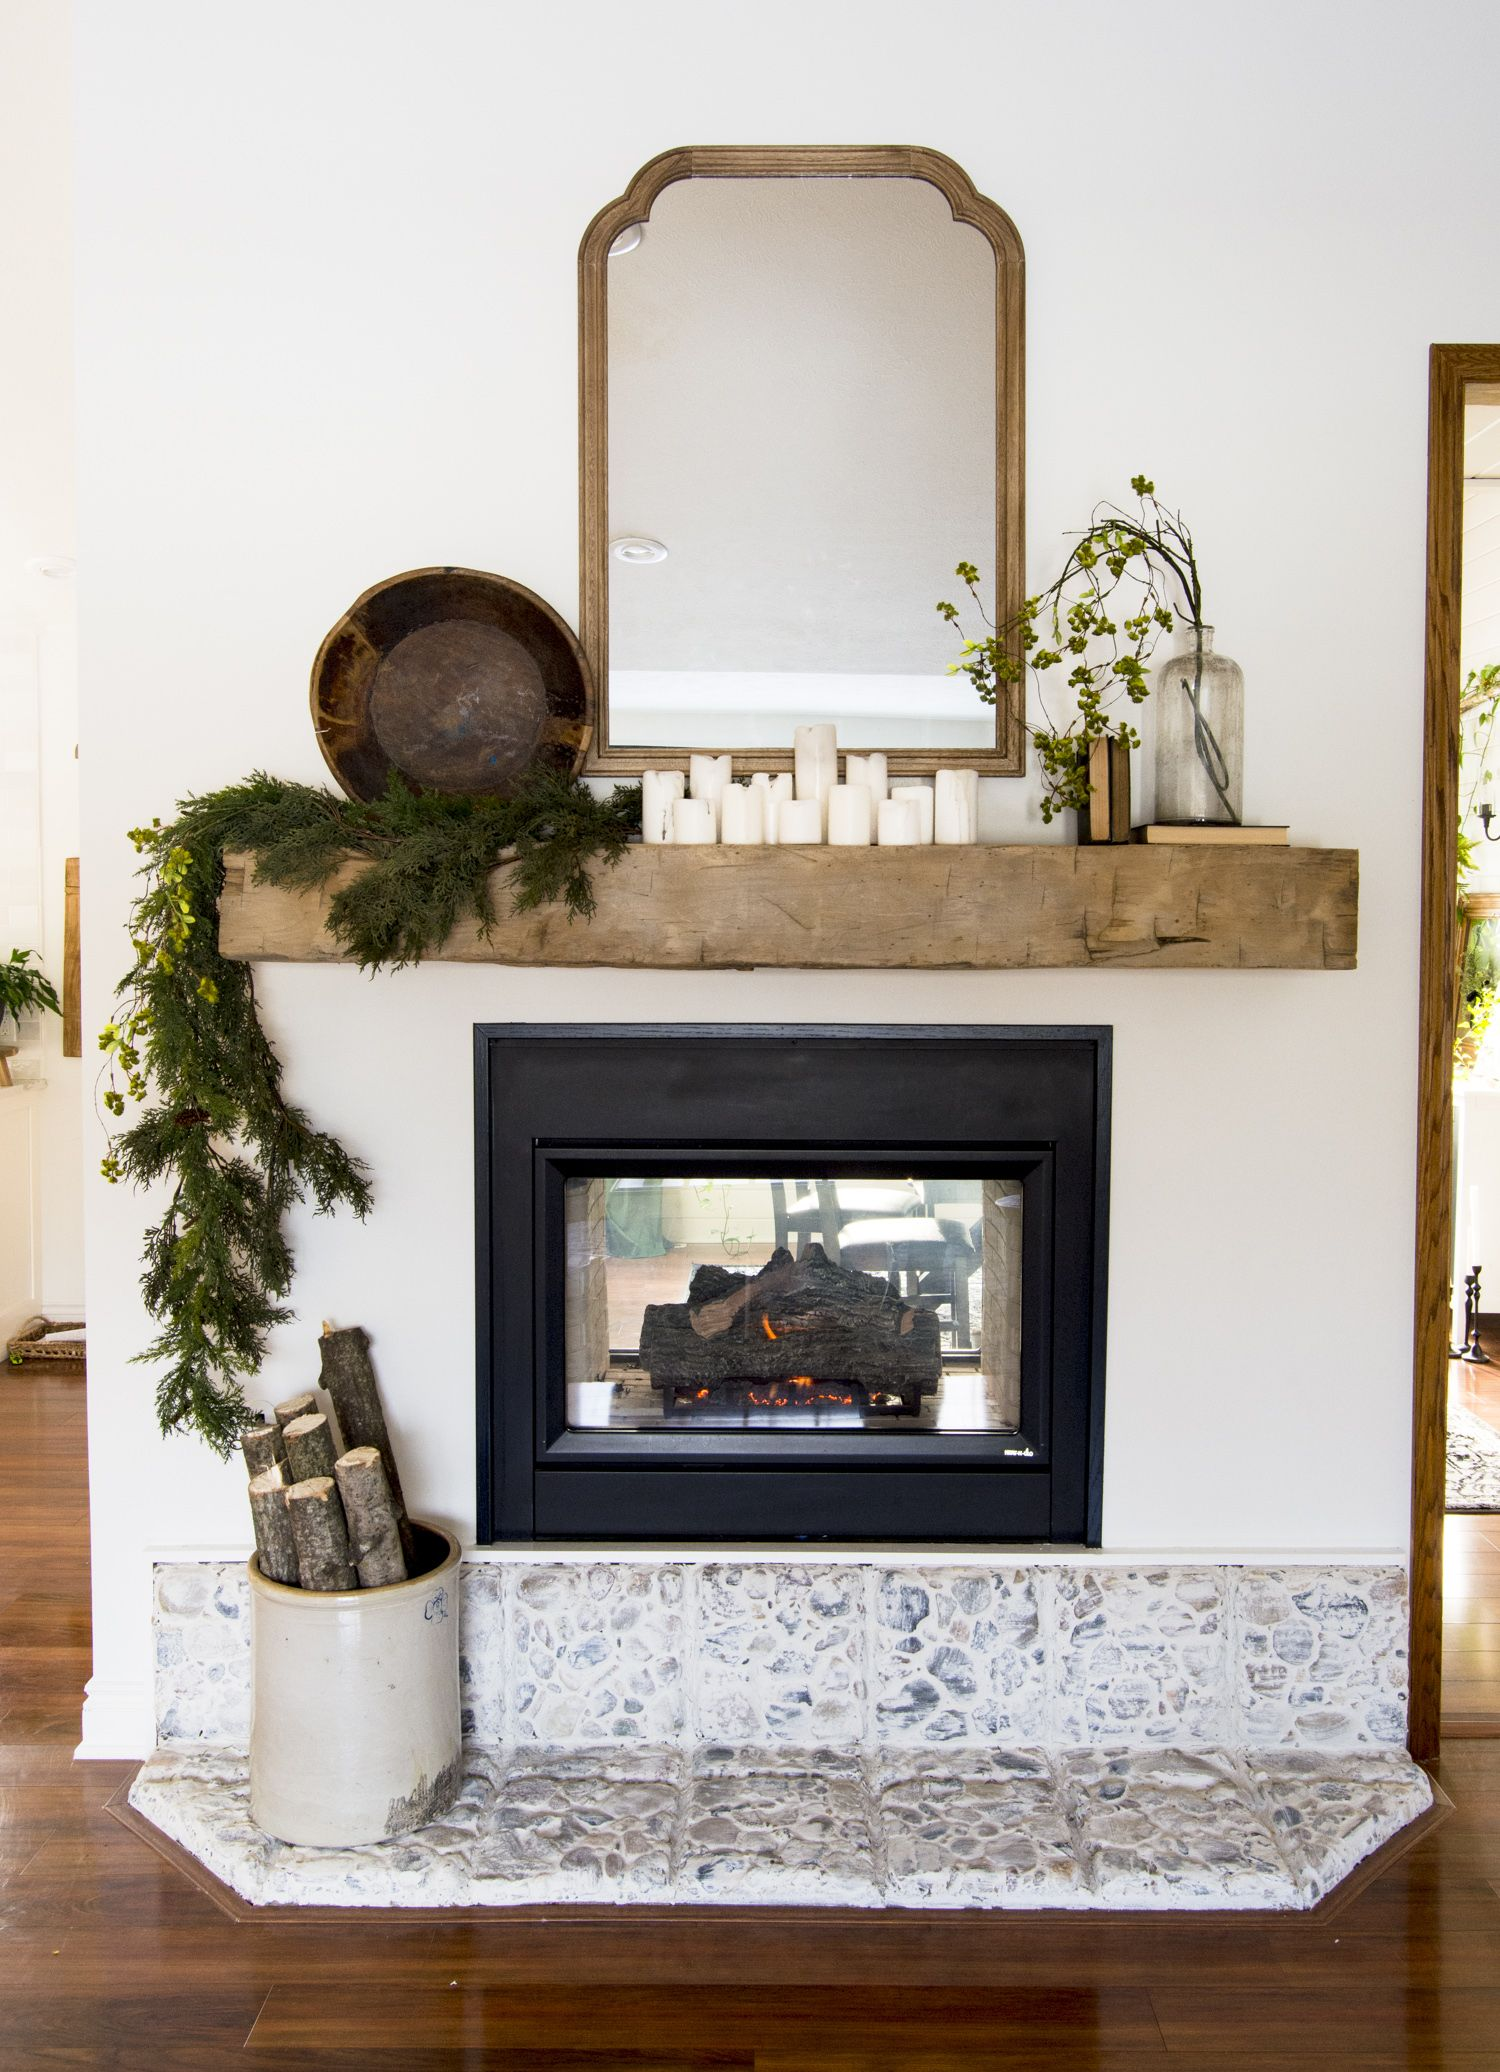 Styling A Rustic Barn Beam Mantel With Modern Farmhouse Mantel Decor In 2020 Farmhouse Mantel Rustic Mantel Mantel Decorations